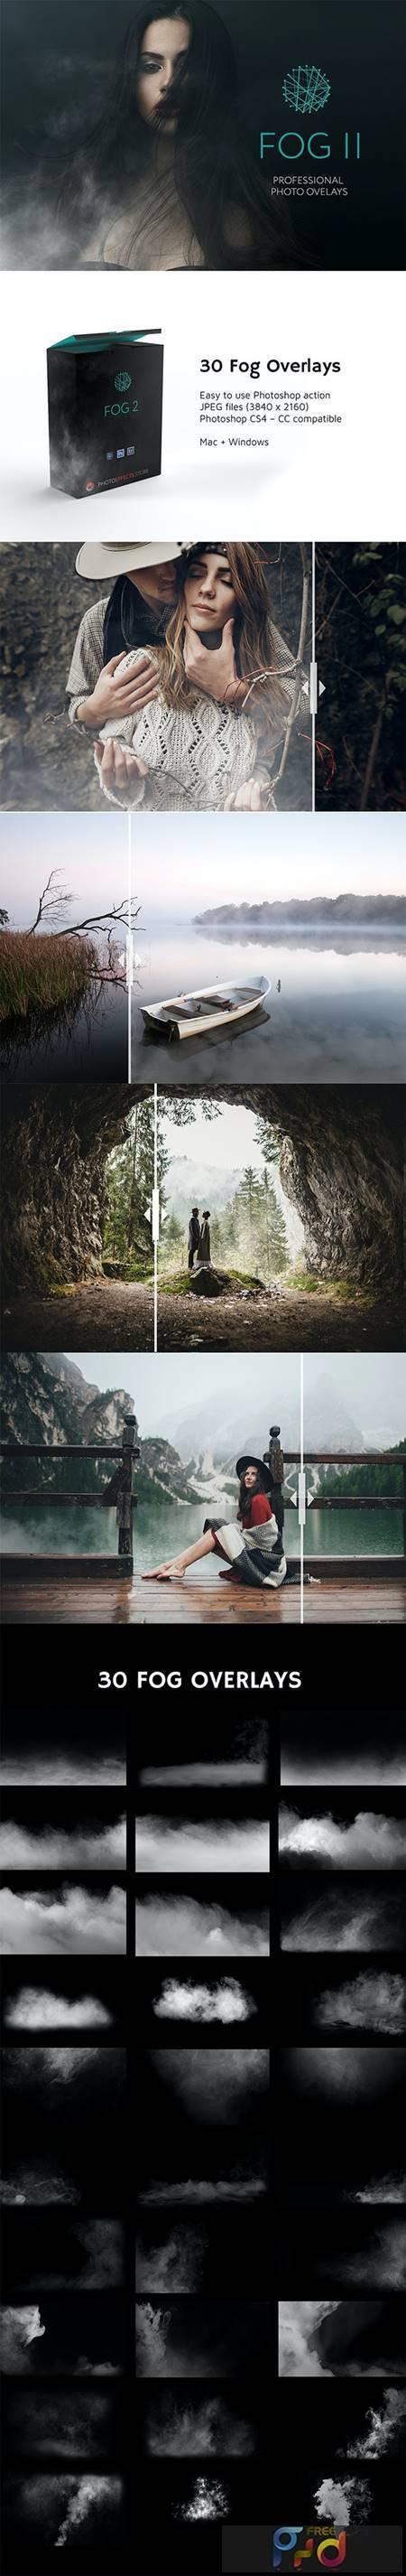 30 Fog Photo Overlays 2.0 27028166 1